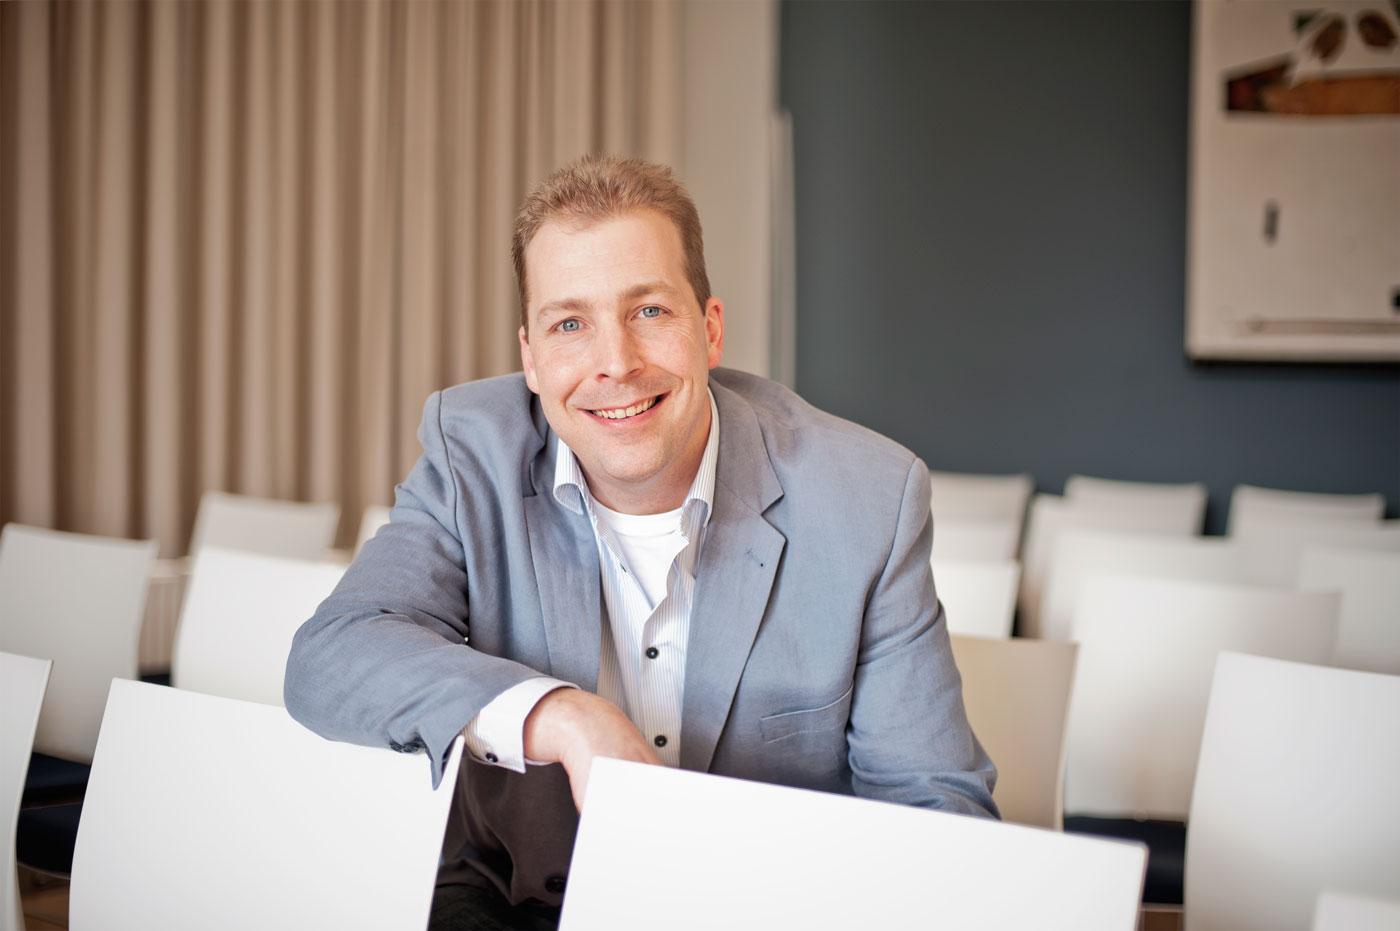 Michael Schreiber